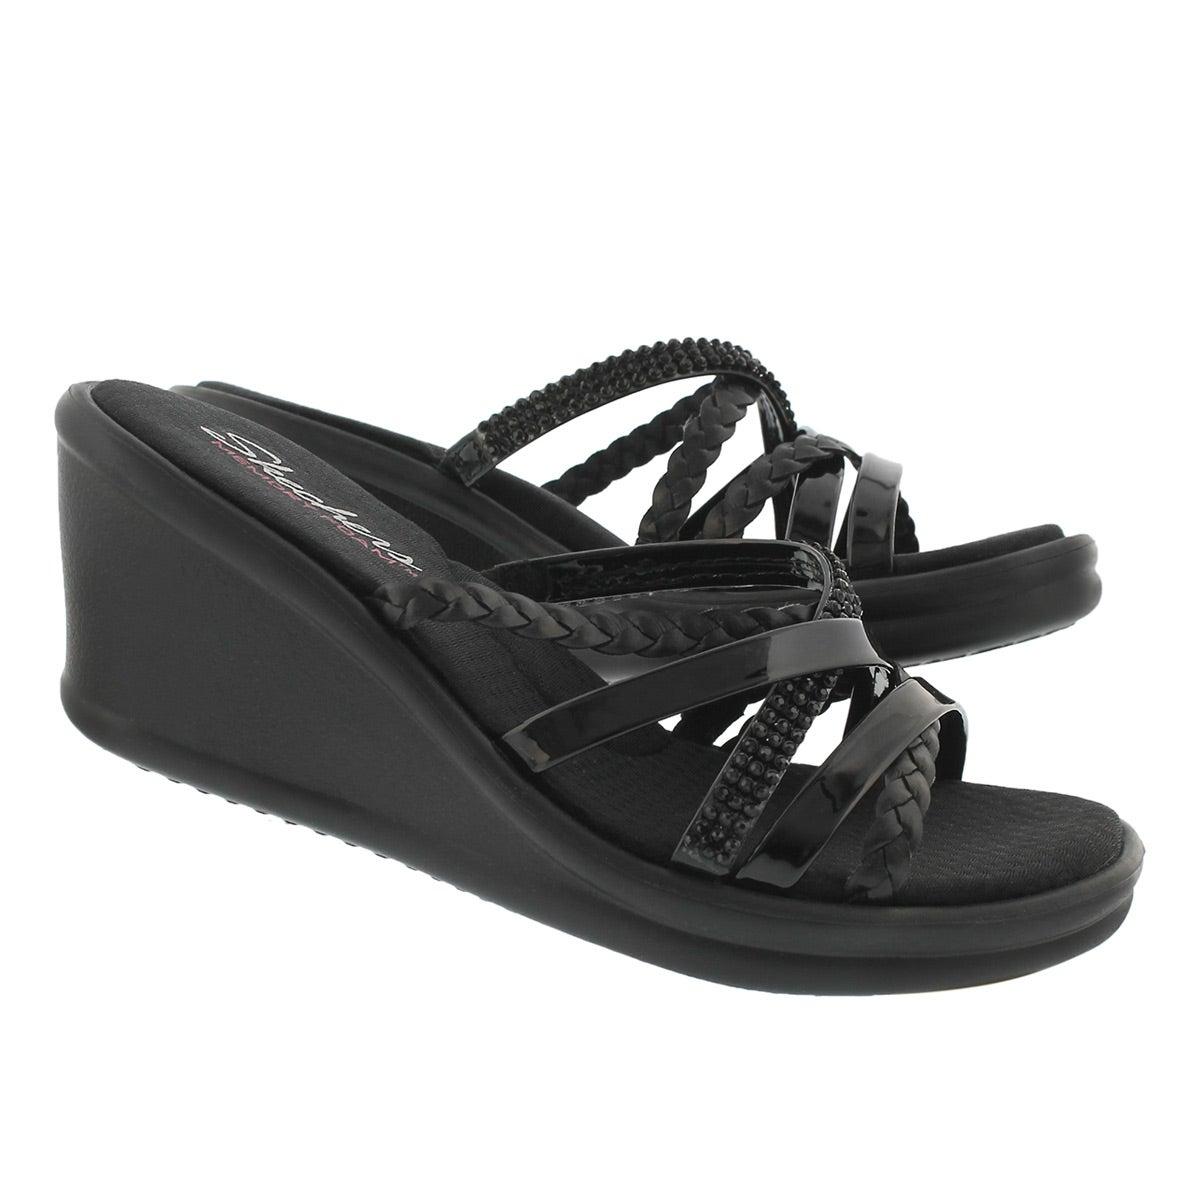 Lds Wild Child black wedge sandal